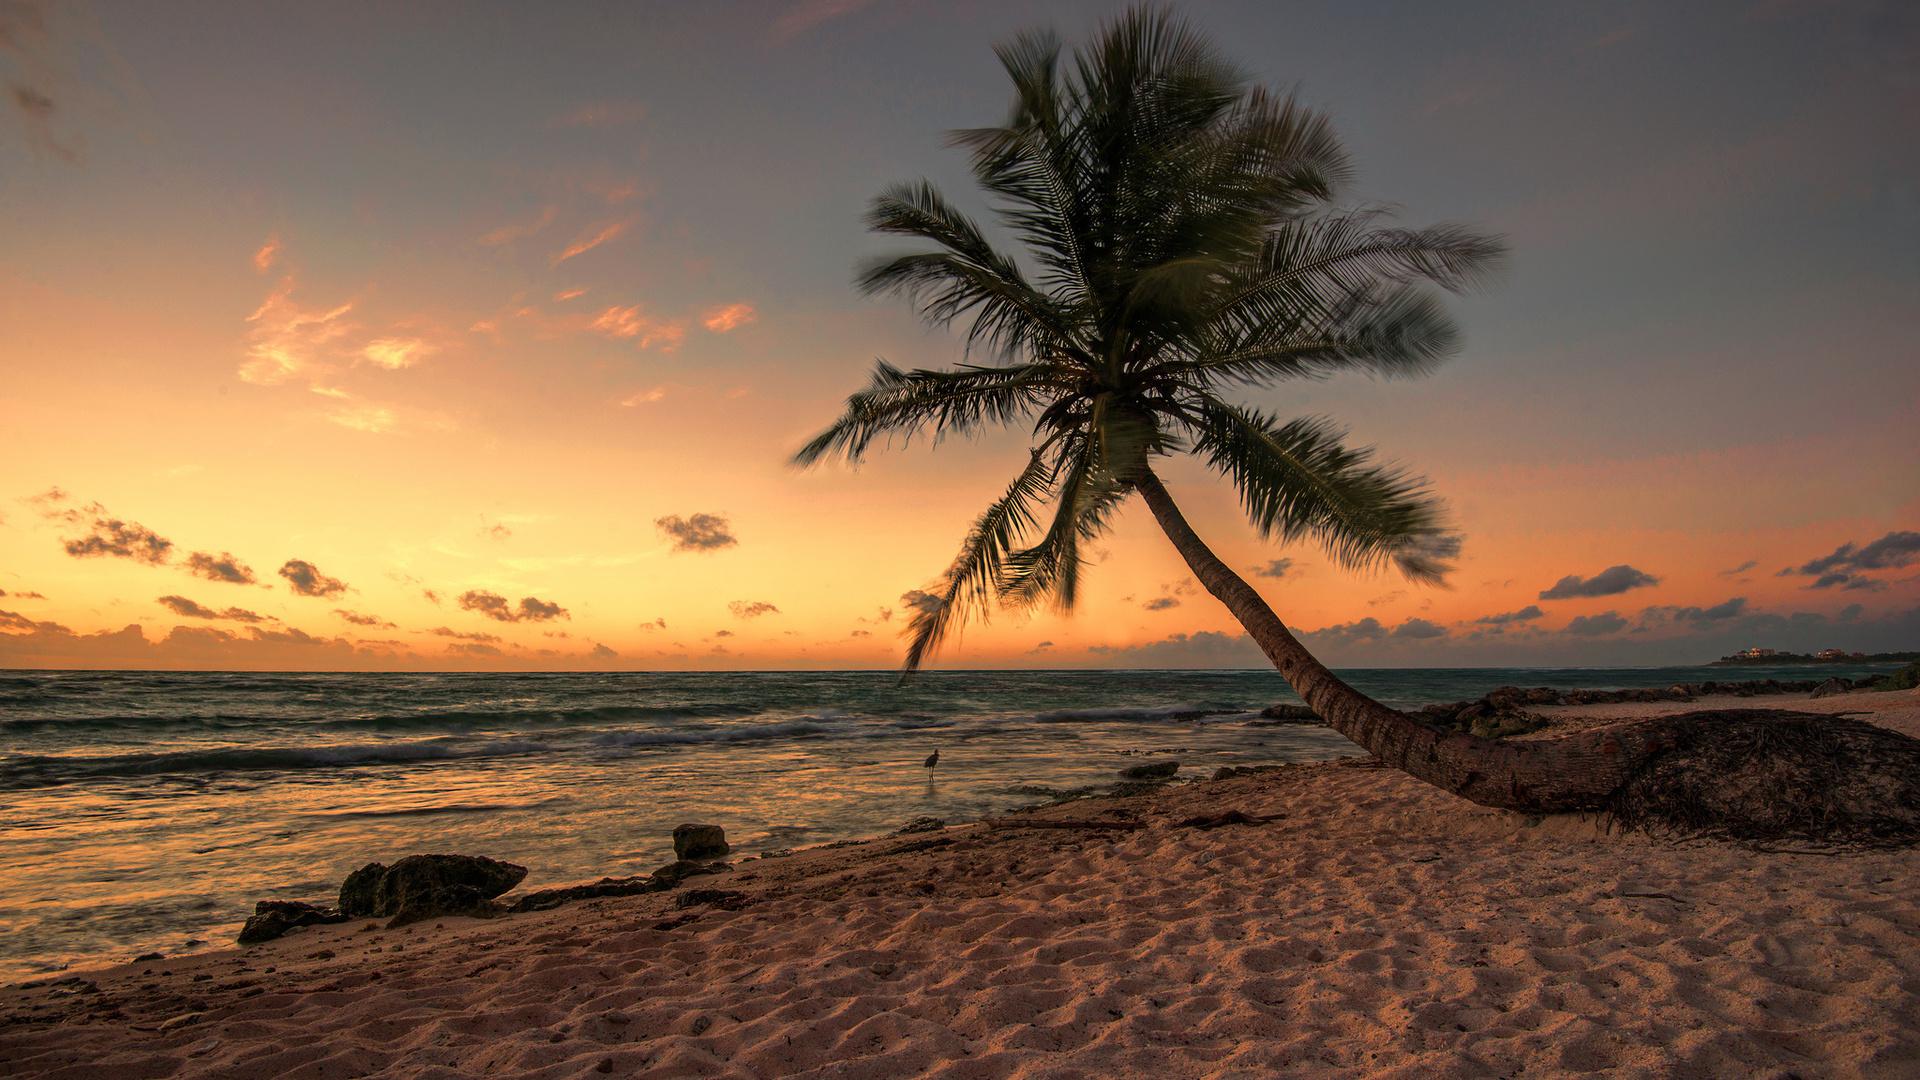 Image For Beach Dream Night Wallpaper 1920x1080 Download Hd Wallpaper Wallpapertip